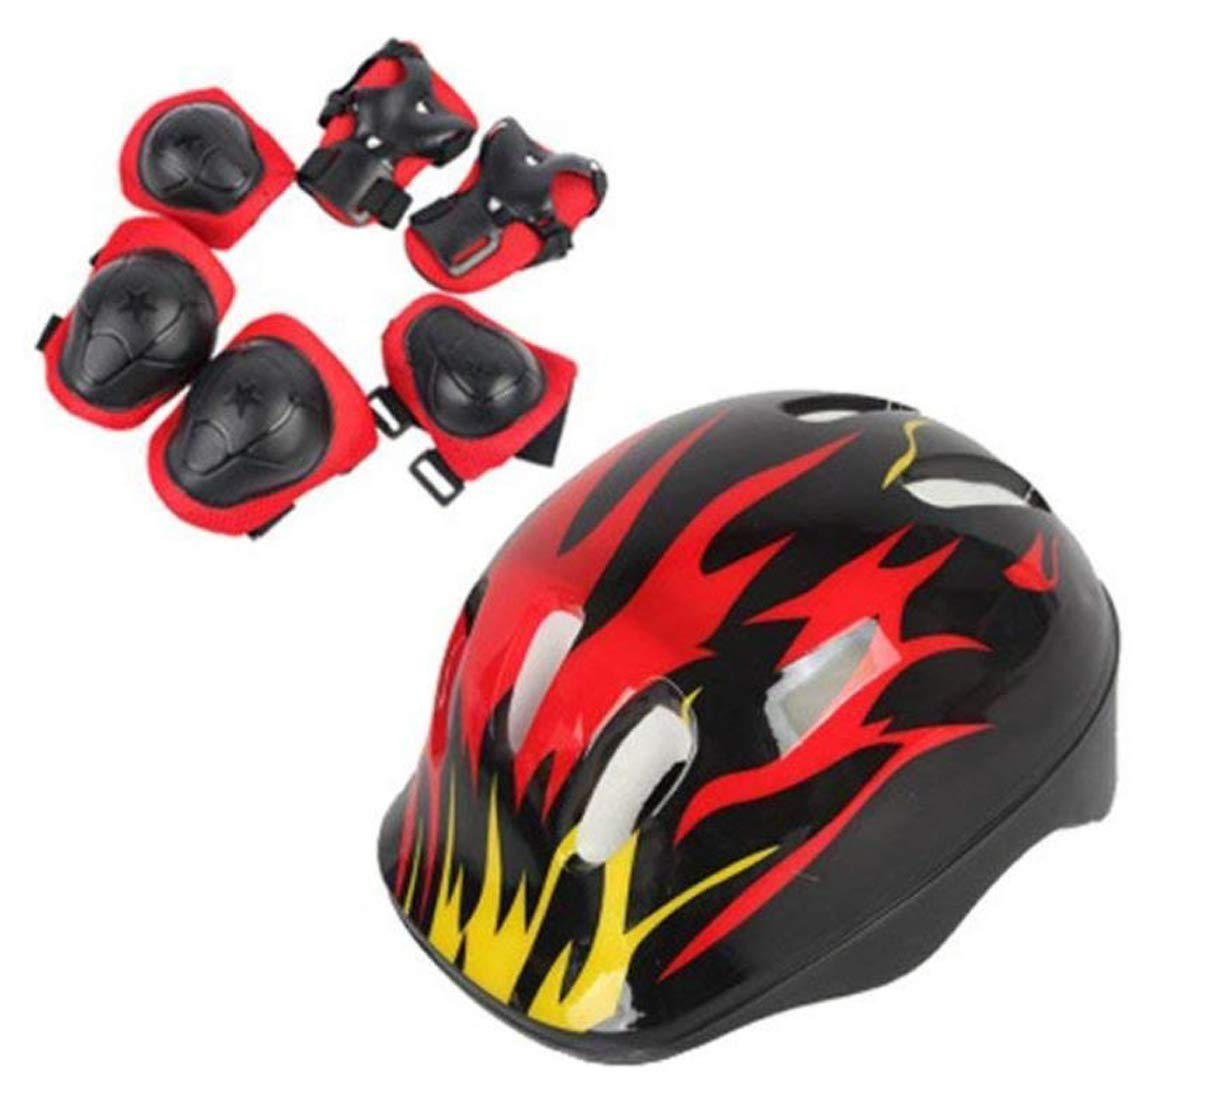 TUPWEL 1Set Adjustable Protective Gear Set 8-14 Years Old Children Safeguard Elbow Helmet Wrist Knee Pads for Cycling Skating Skateboard Skating Skate Skateboarding Child Outdoor Sports Boys